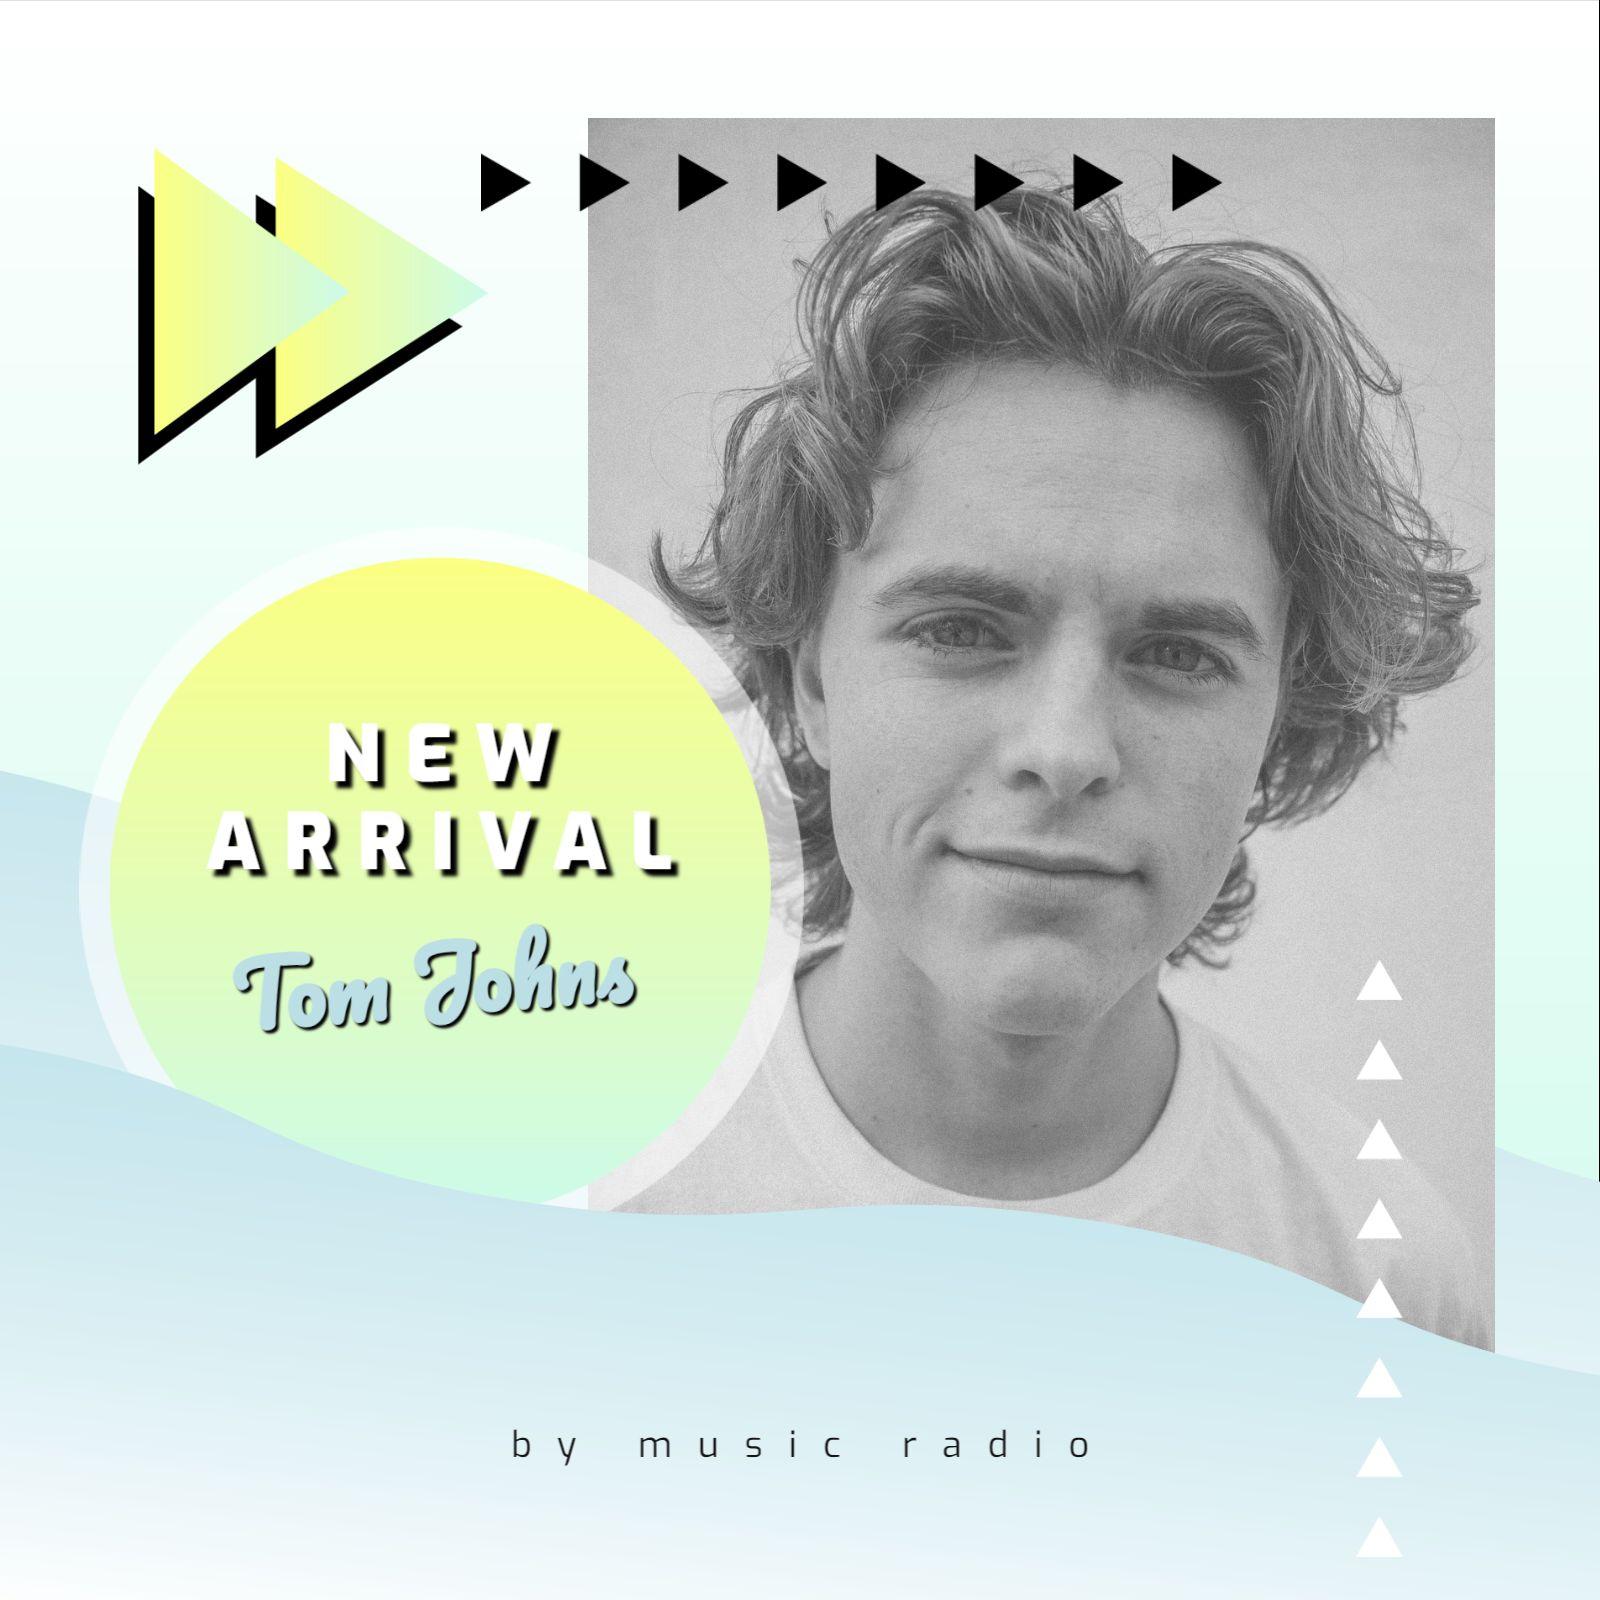 New Arrival Digital Album Cover Template